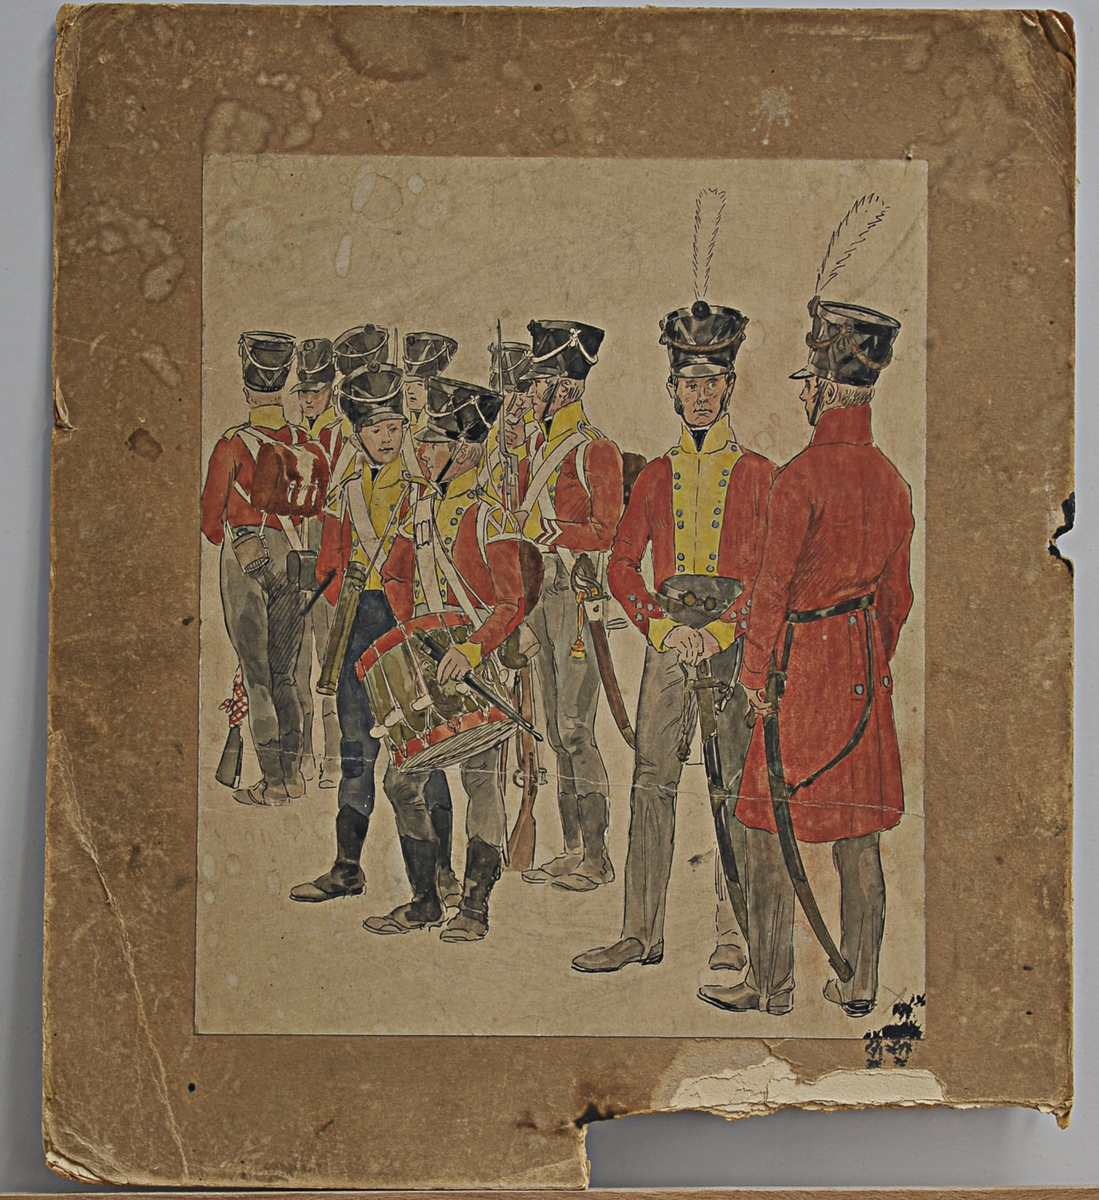 Soldater, infantrister i det 2. Trondhjemske infanteri regiment av 1814.